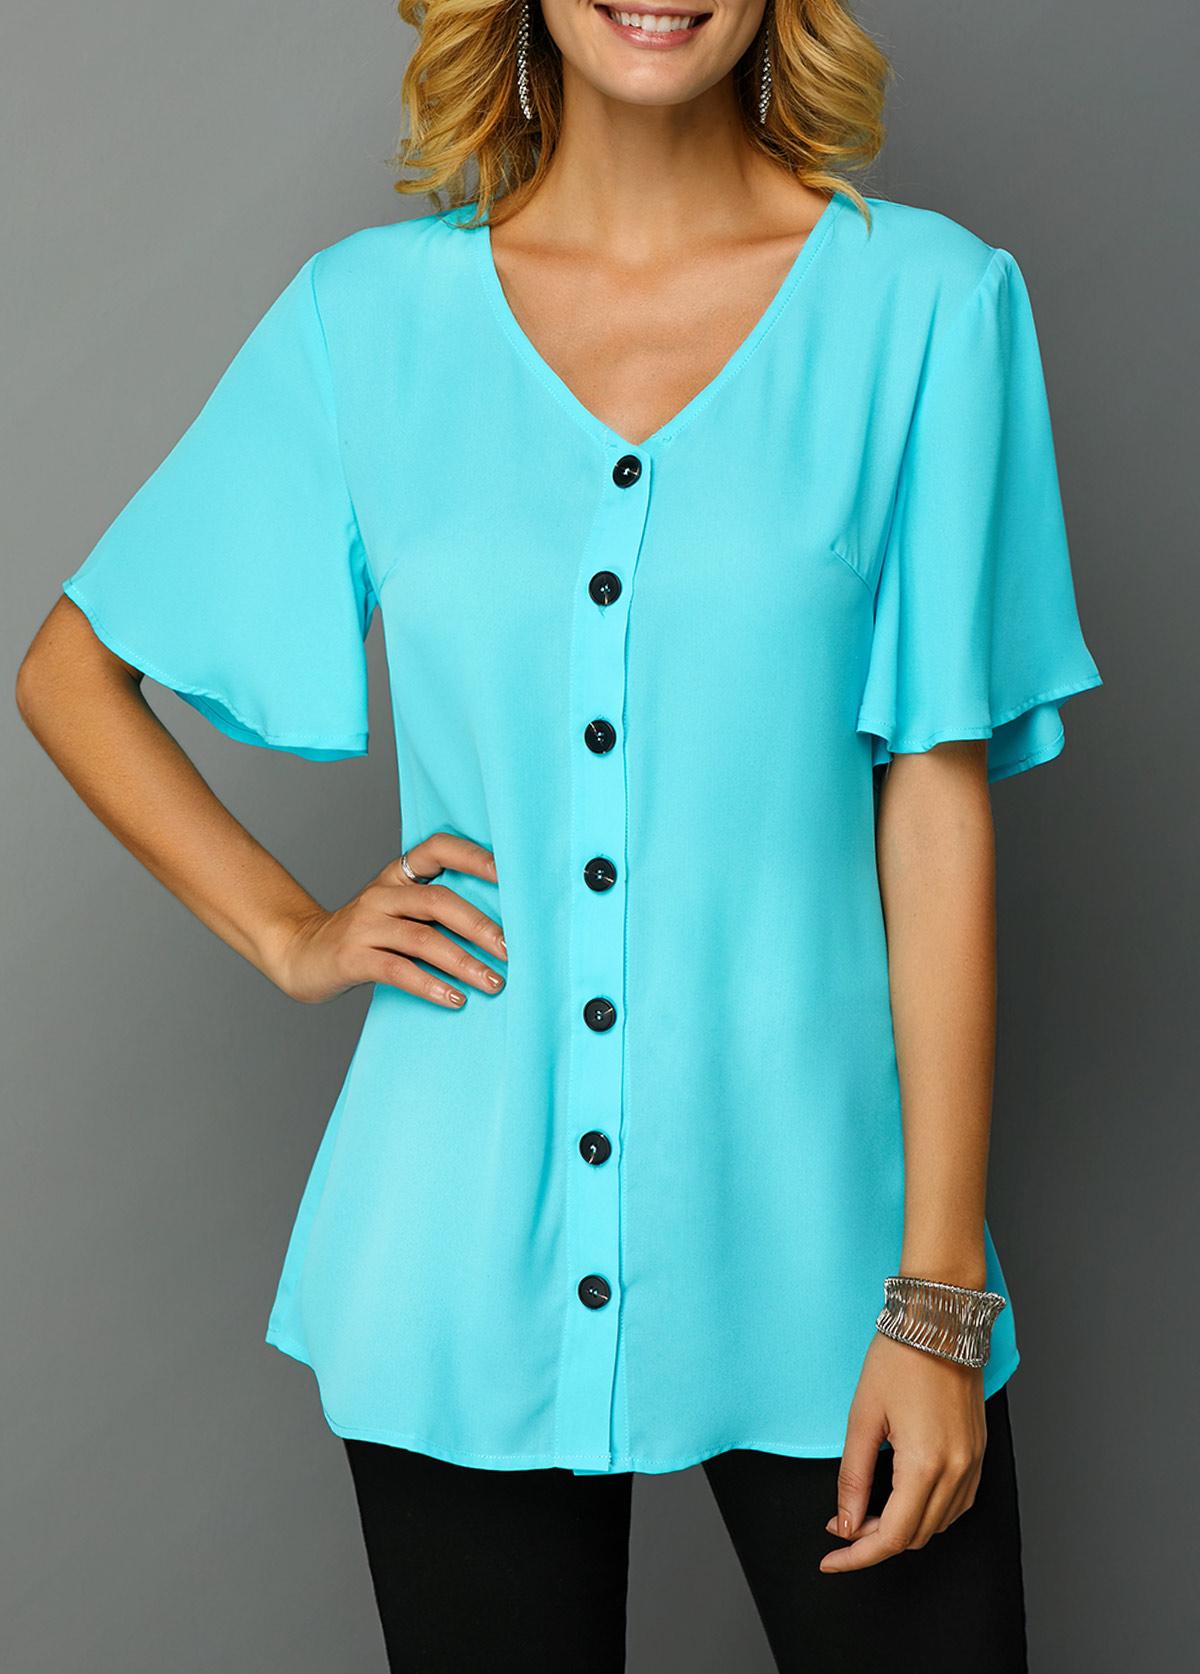 Button Up V Neck Short Sleeve T Shirt